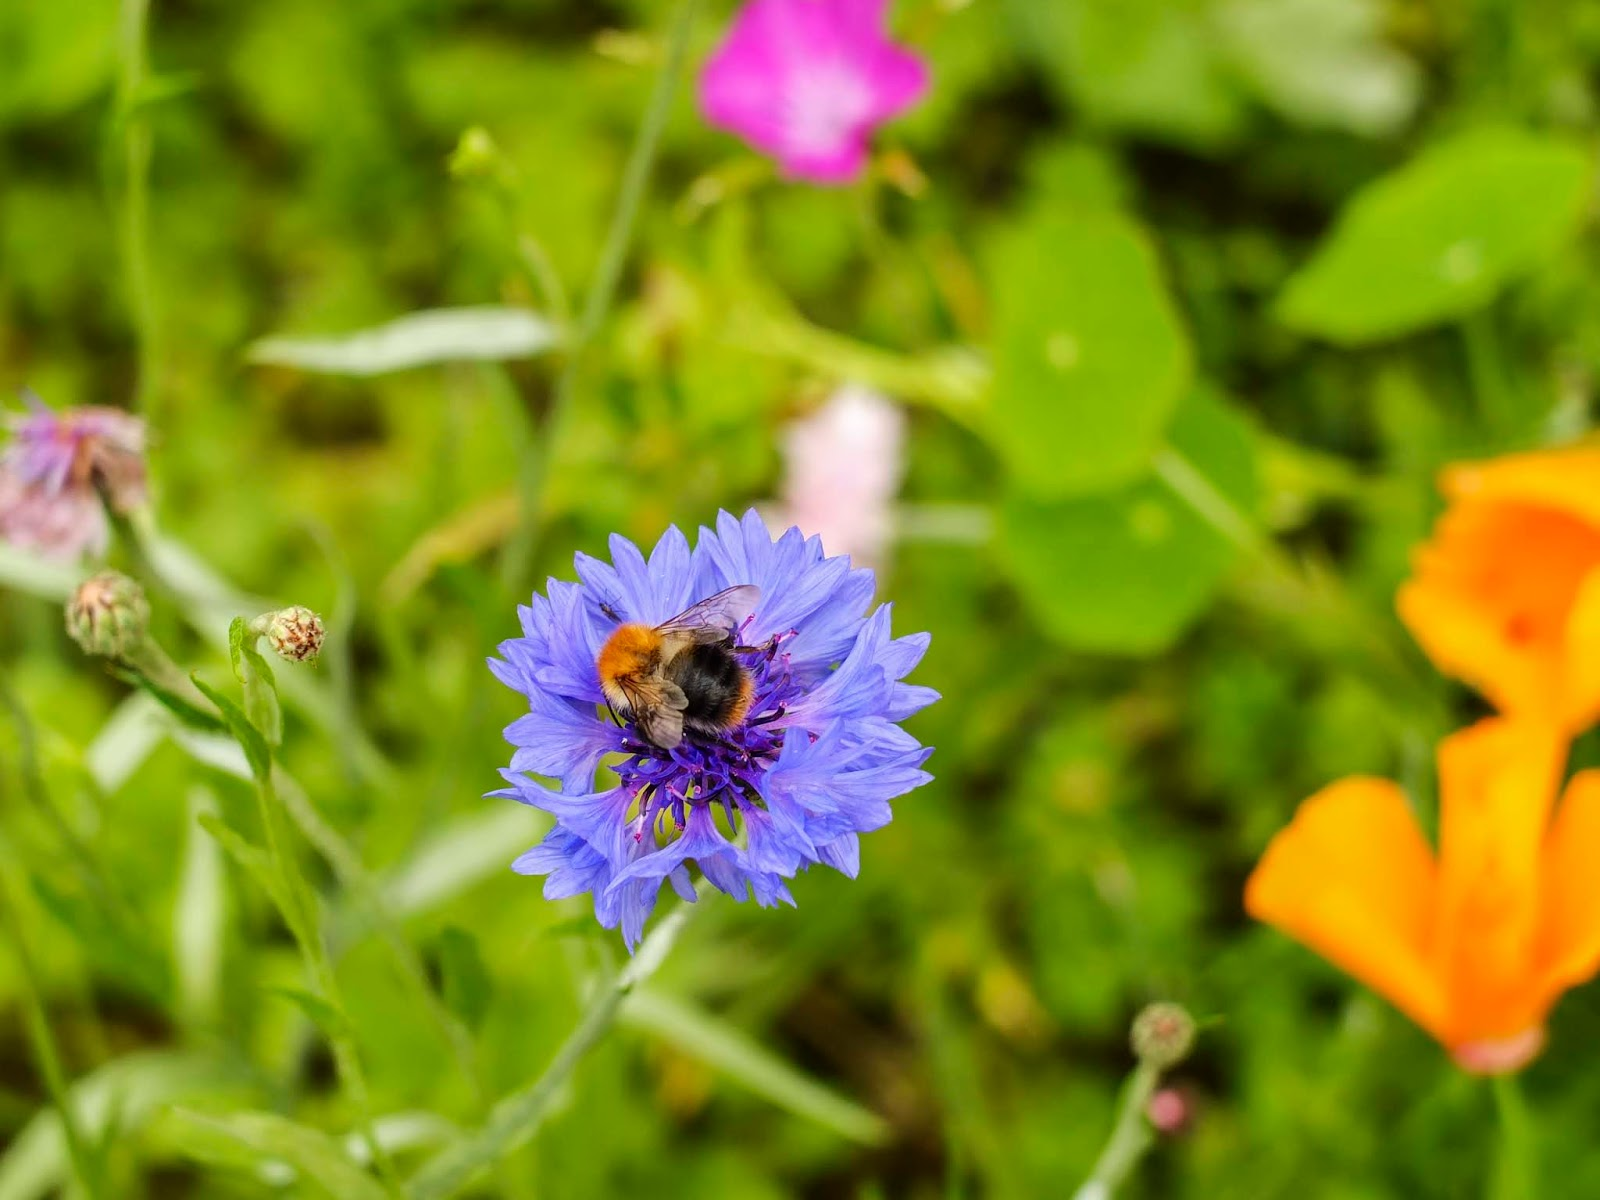 A bee sitting on a blue cornflower in a wildflower garden.